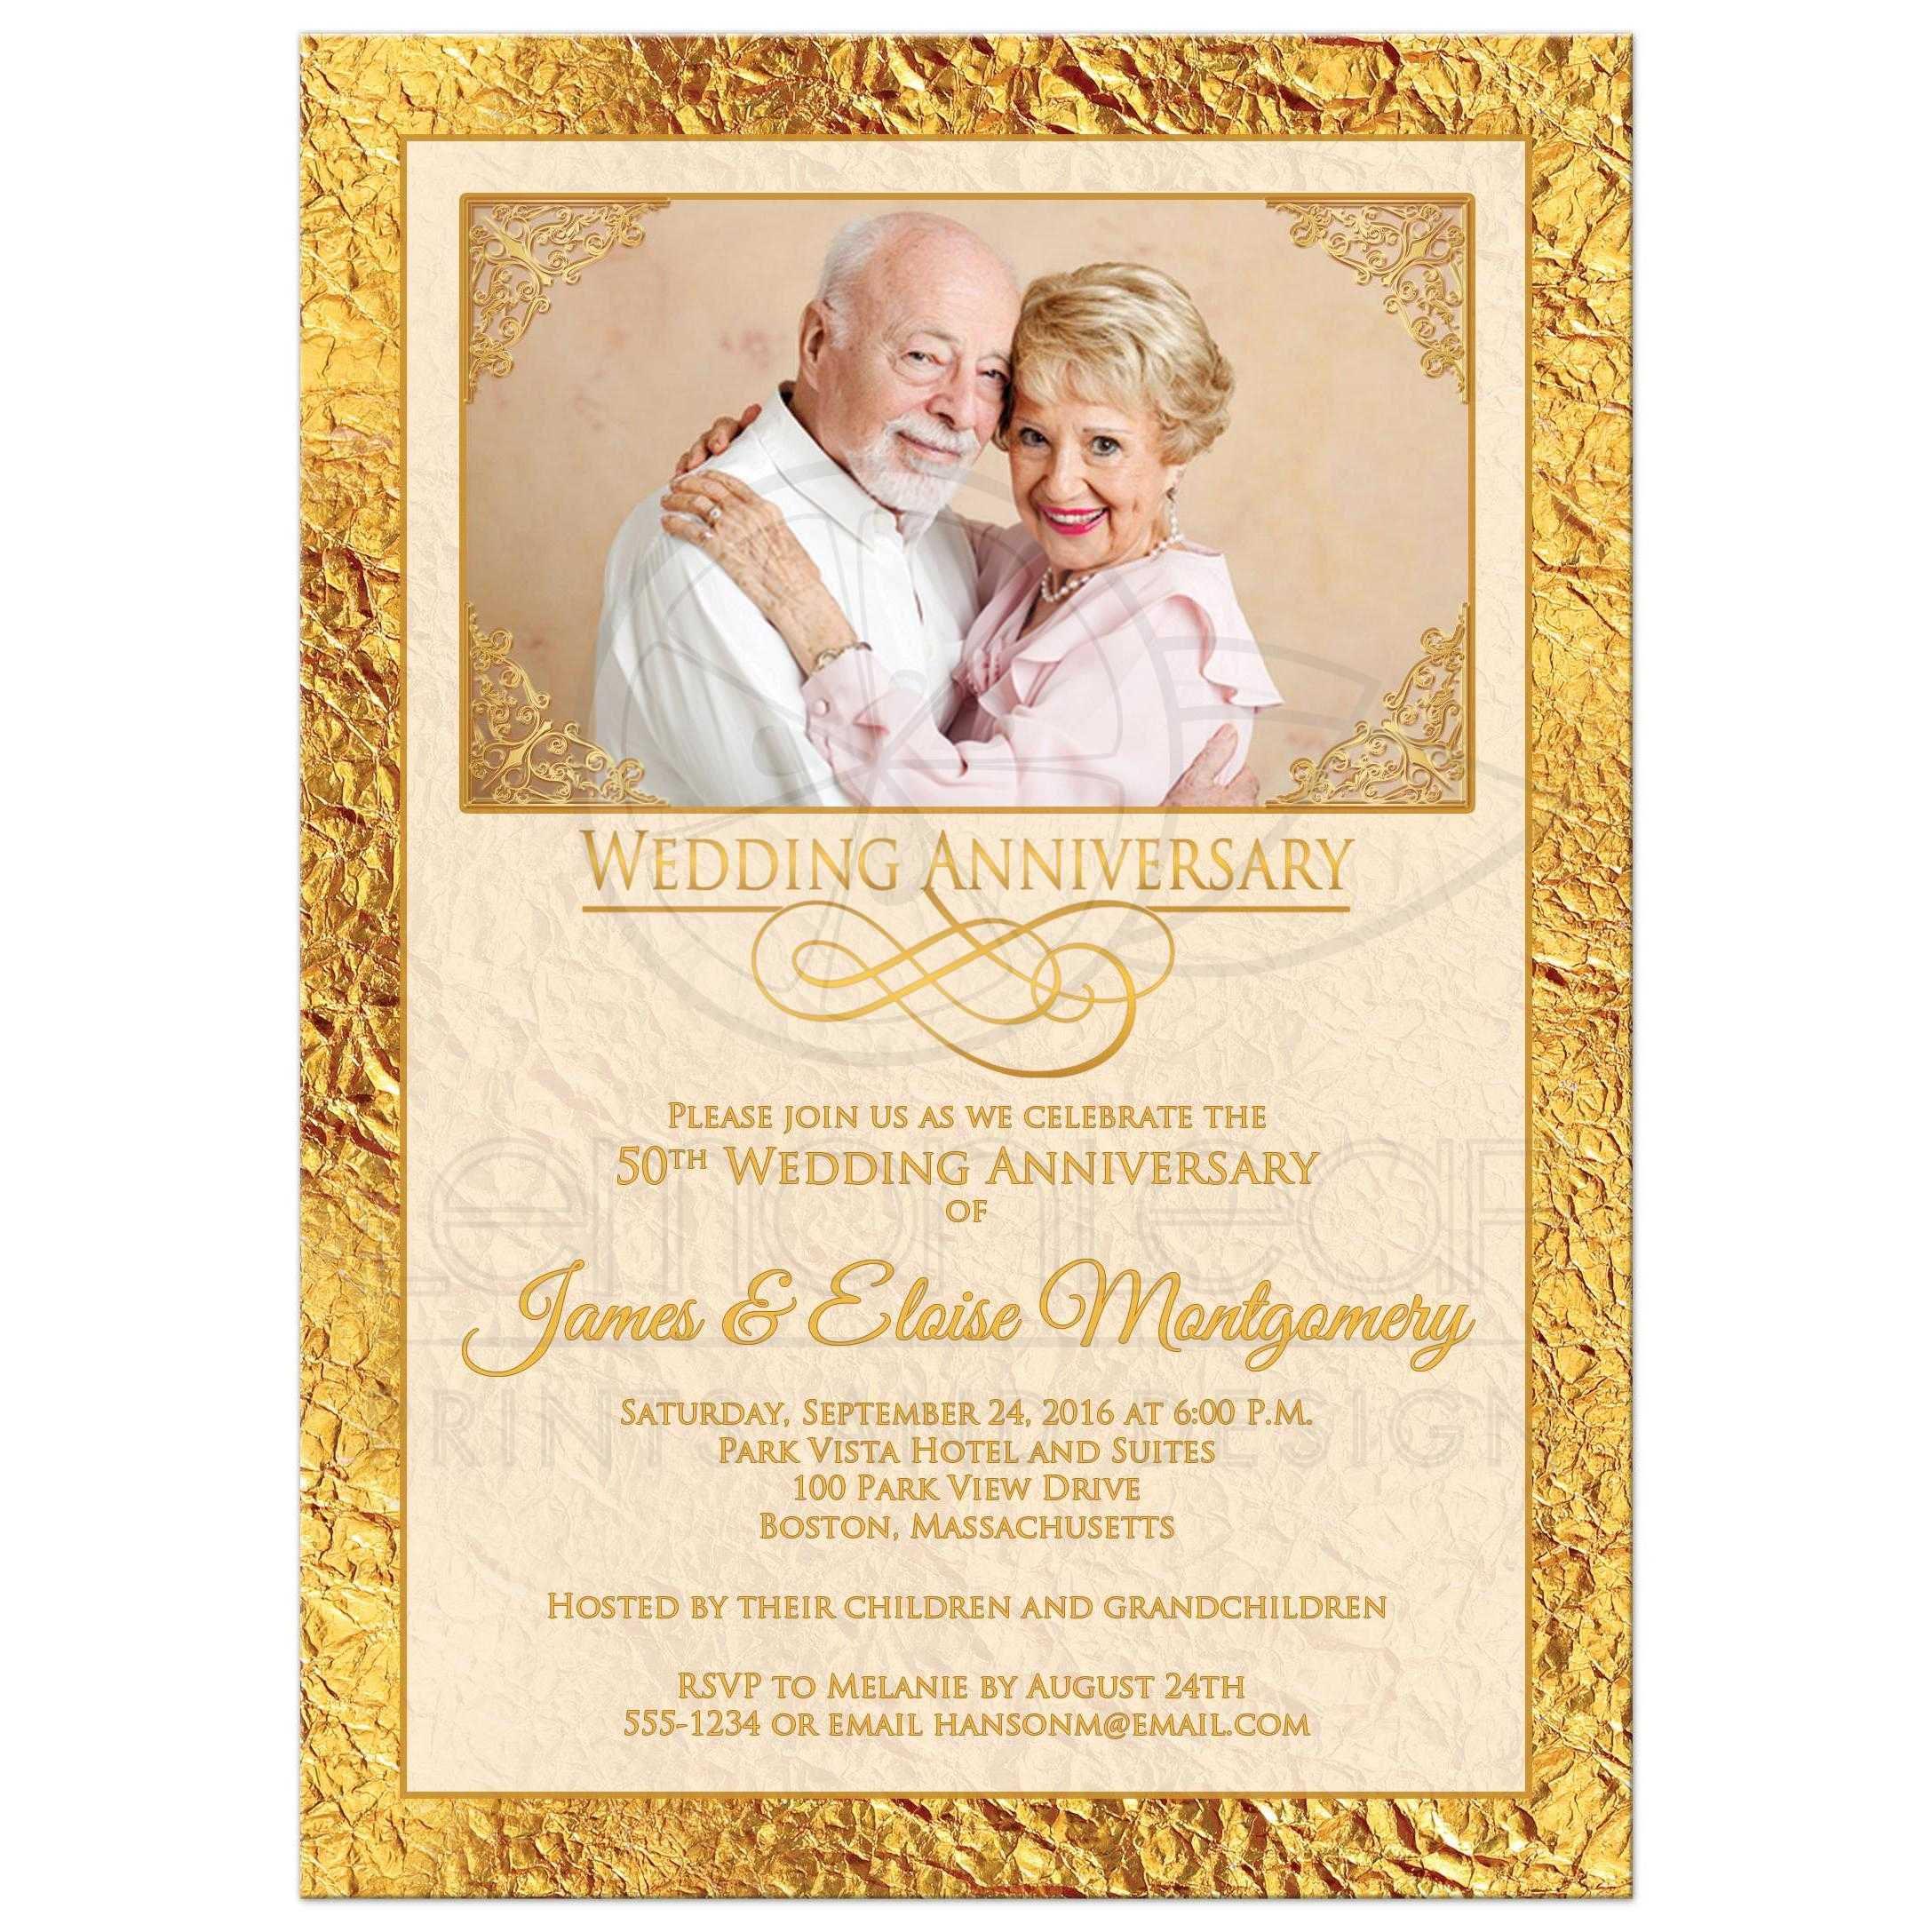 005 Wondrou 50th Anniversary Invitation Design High Definition  Designs Wedding Template Microsoft Word Surprise Party Wording Card IdeaFull